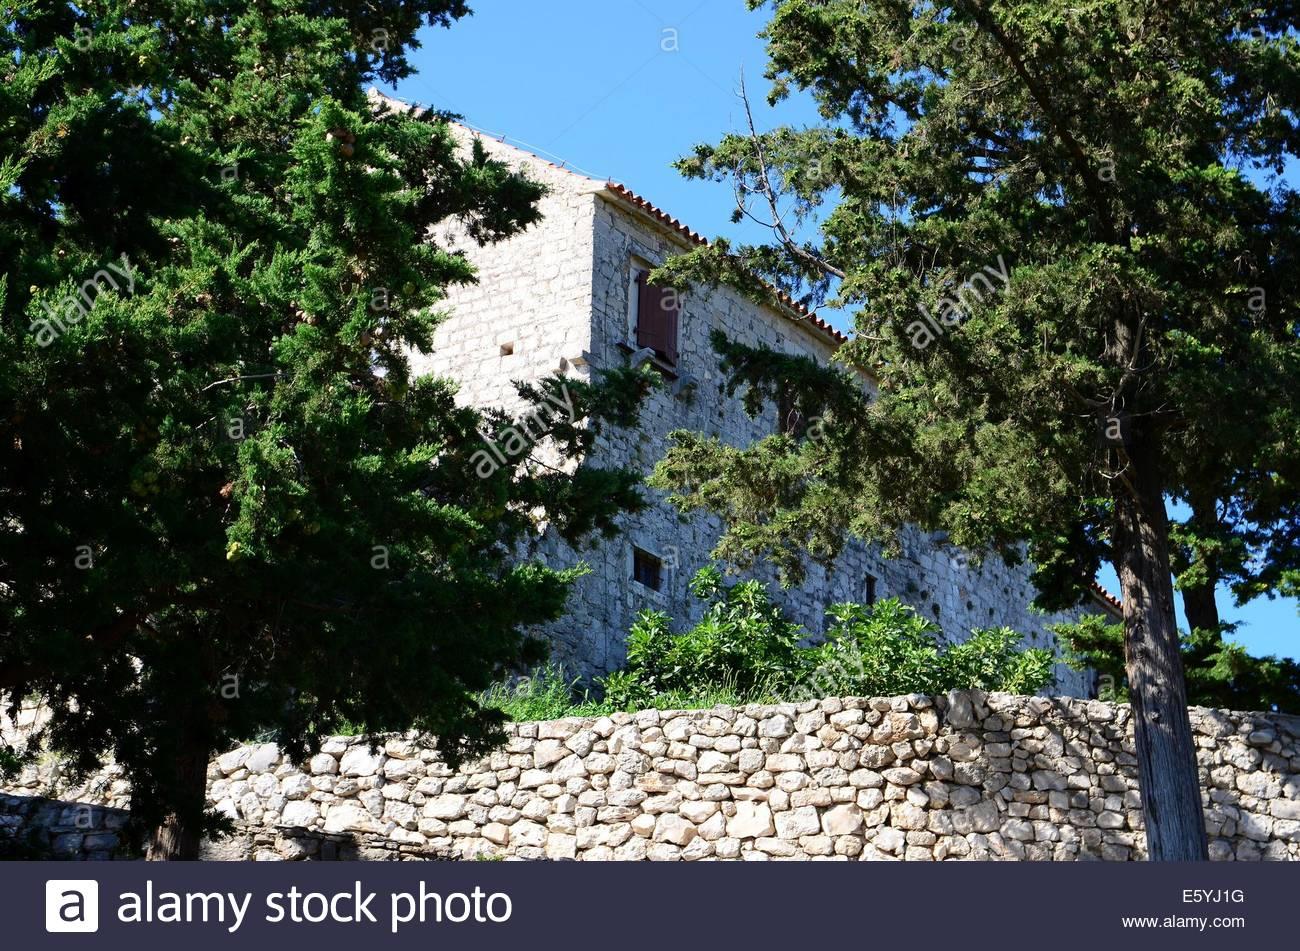 St. Cosmas and Damian Monastery on the hill Cokovac, island of Pasman,Croatia - Stock Image